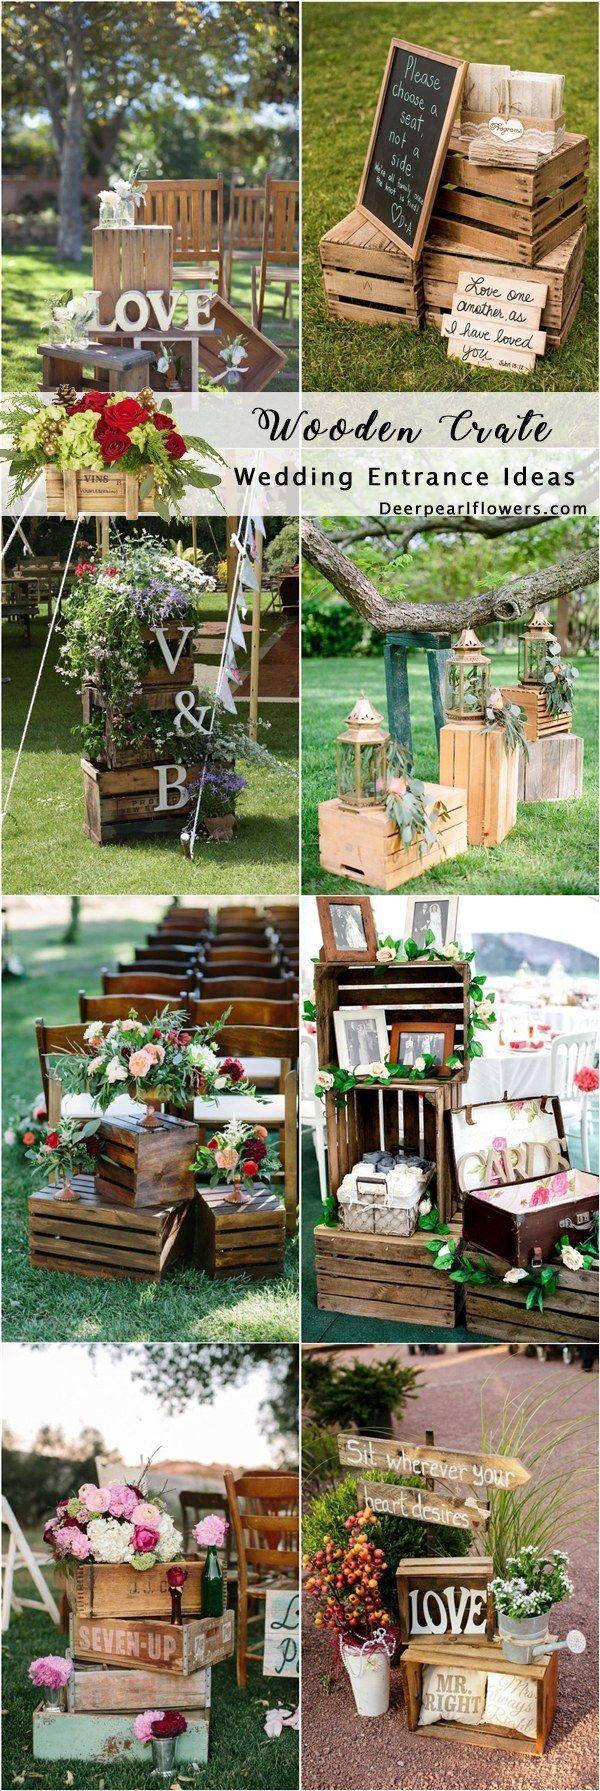 Wood wedding decoration ideas  Pin by Zoeeus Rustic Chic Wedding Ideas on Rustic Wedding